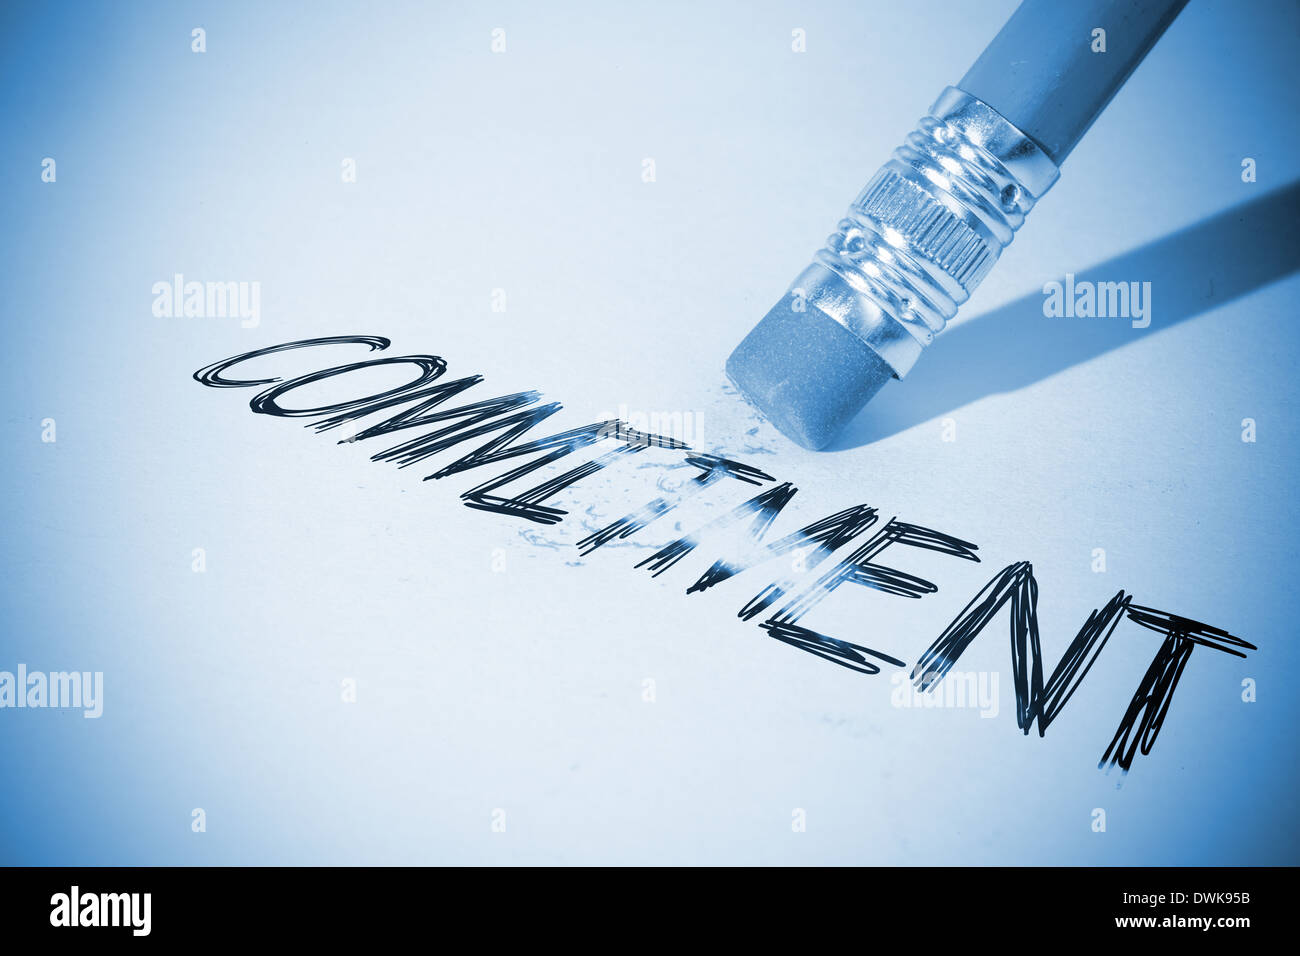 Lápiz de borrar la palabra compromiso Imagen De Stock